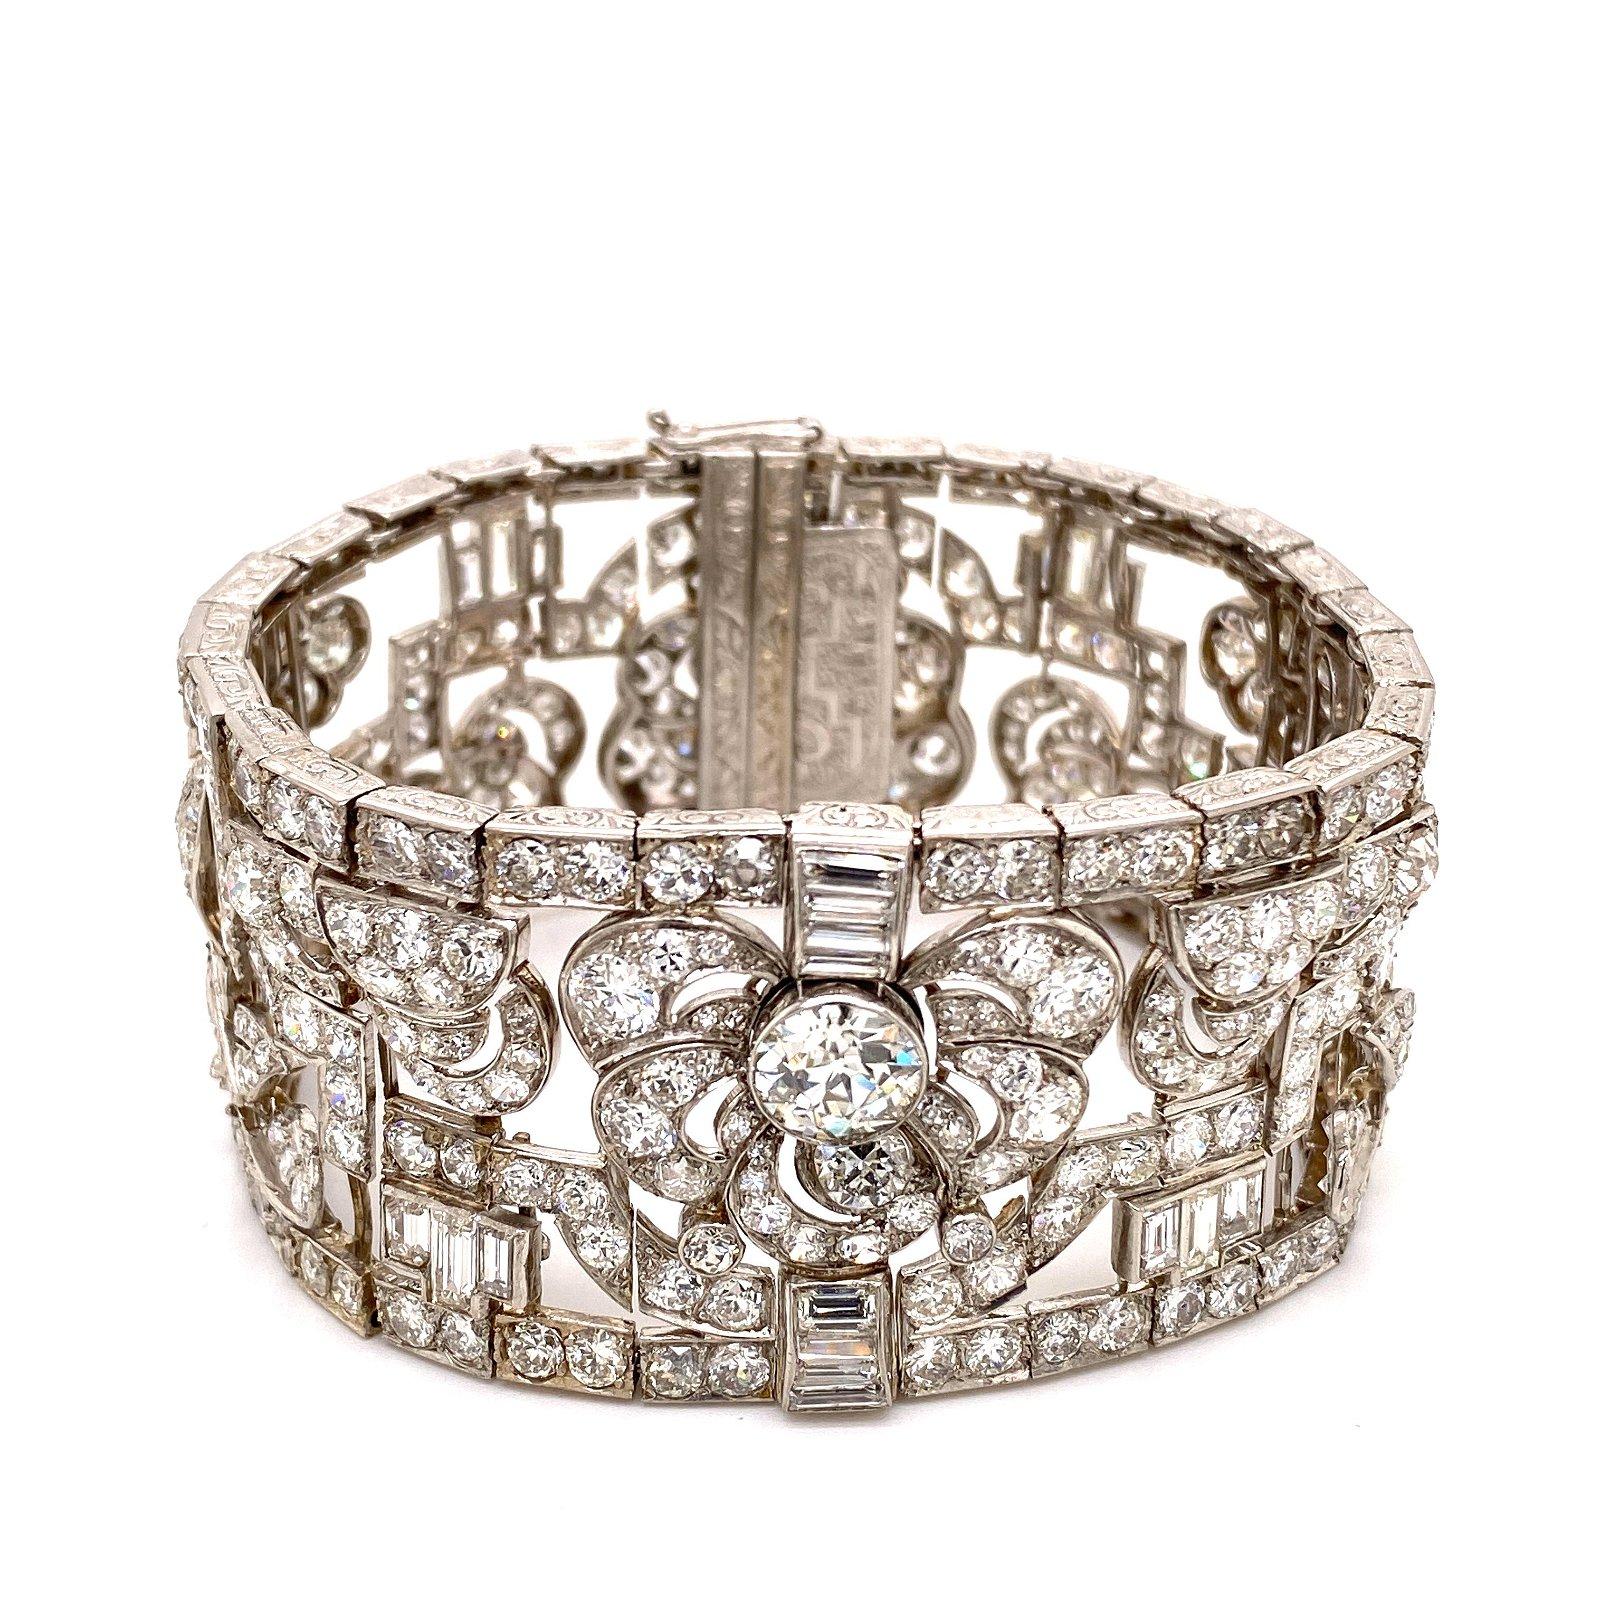 18 k White Gold, Platinum and Diamonds Art Deco